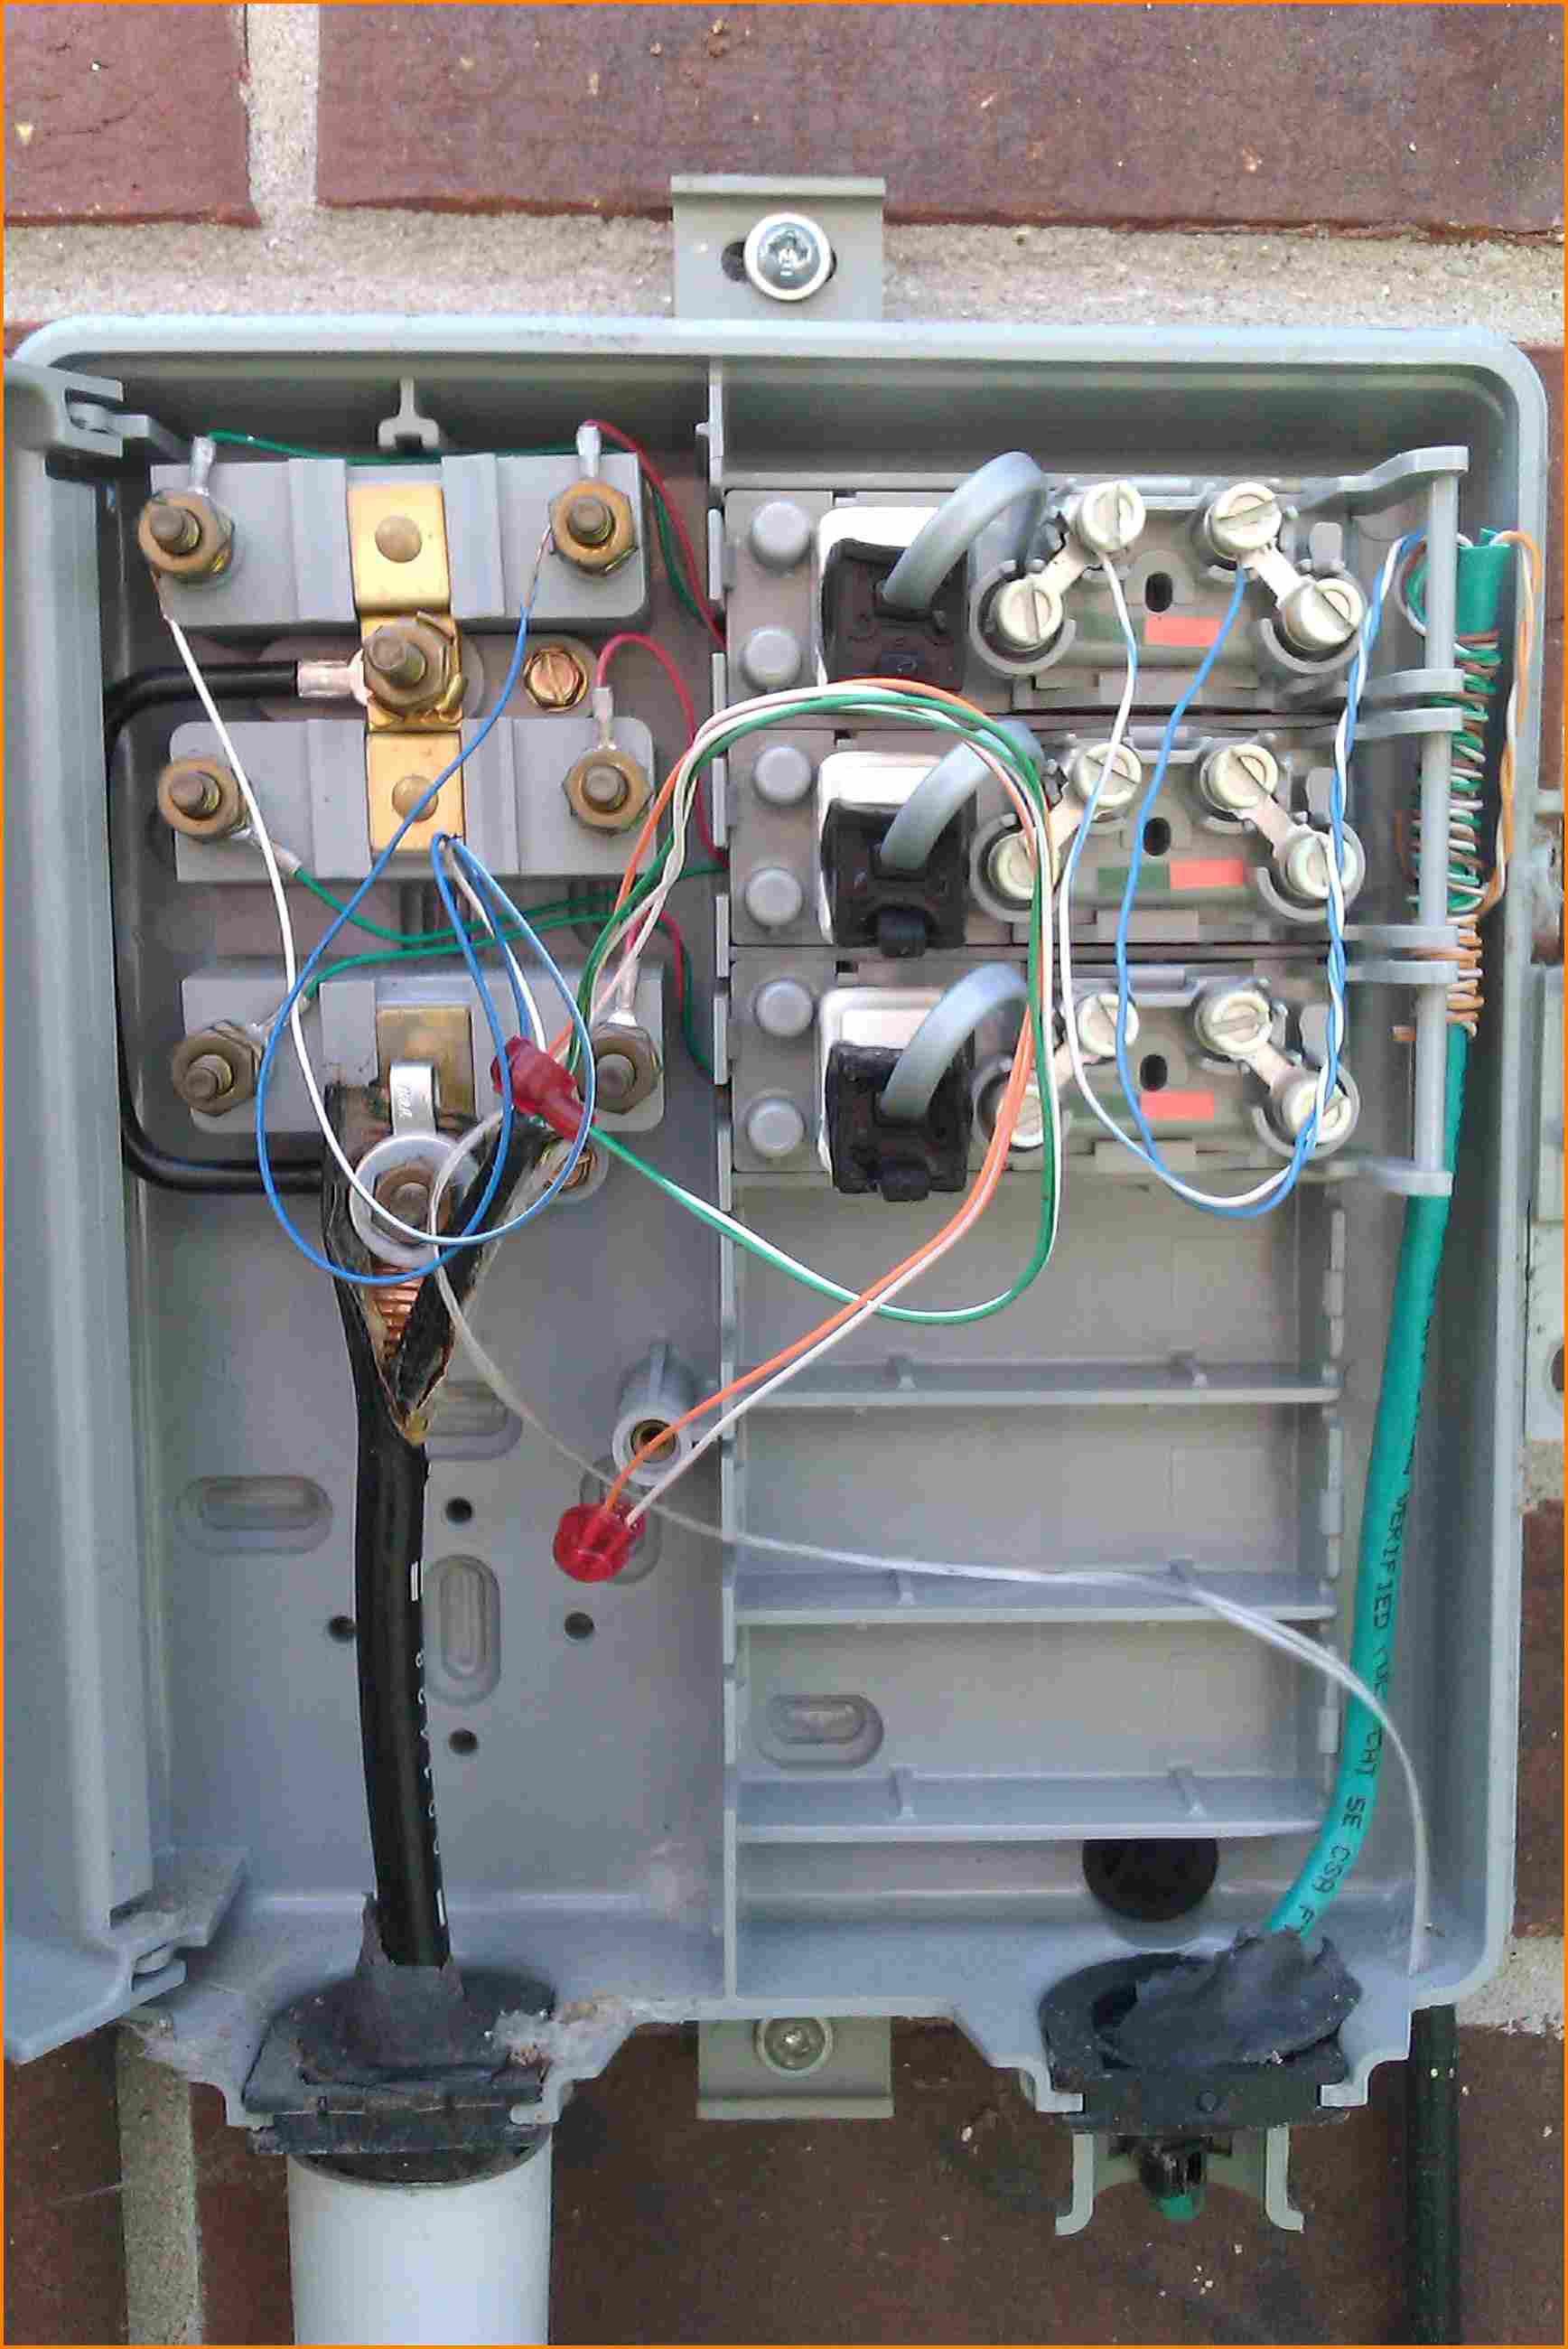 uverse nid wiring diagram winnebago electrical diagrams att u verse schematic at u0026t phone box blog setup t home